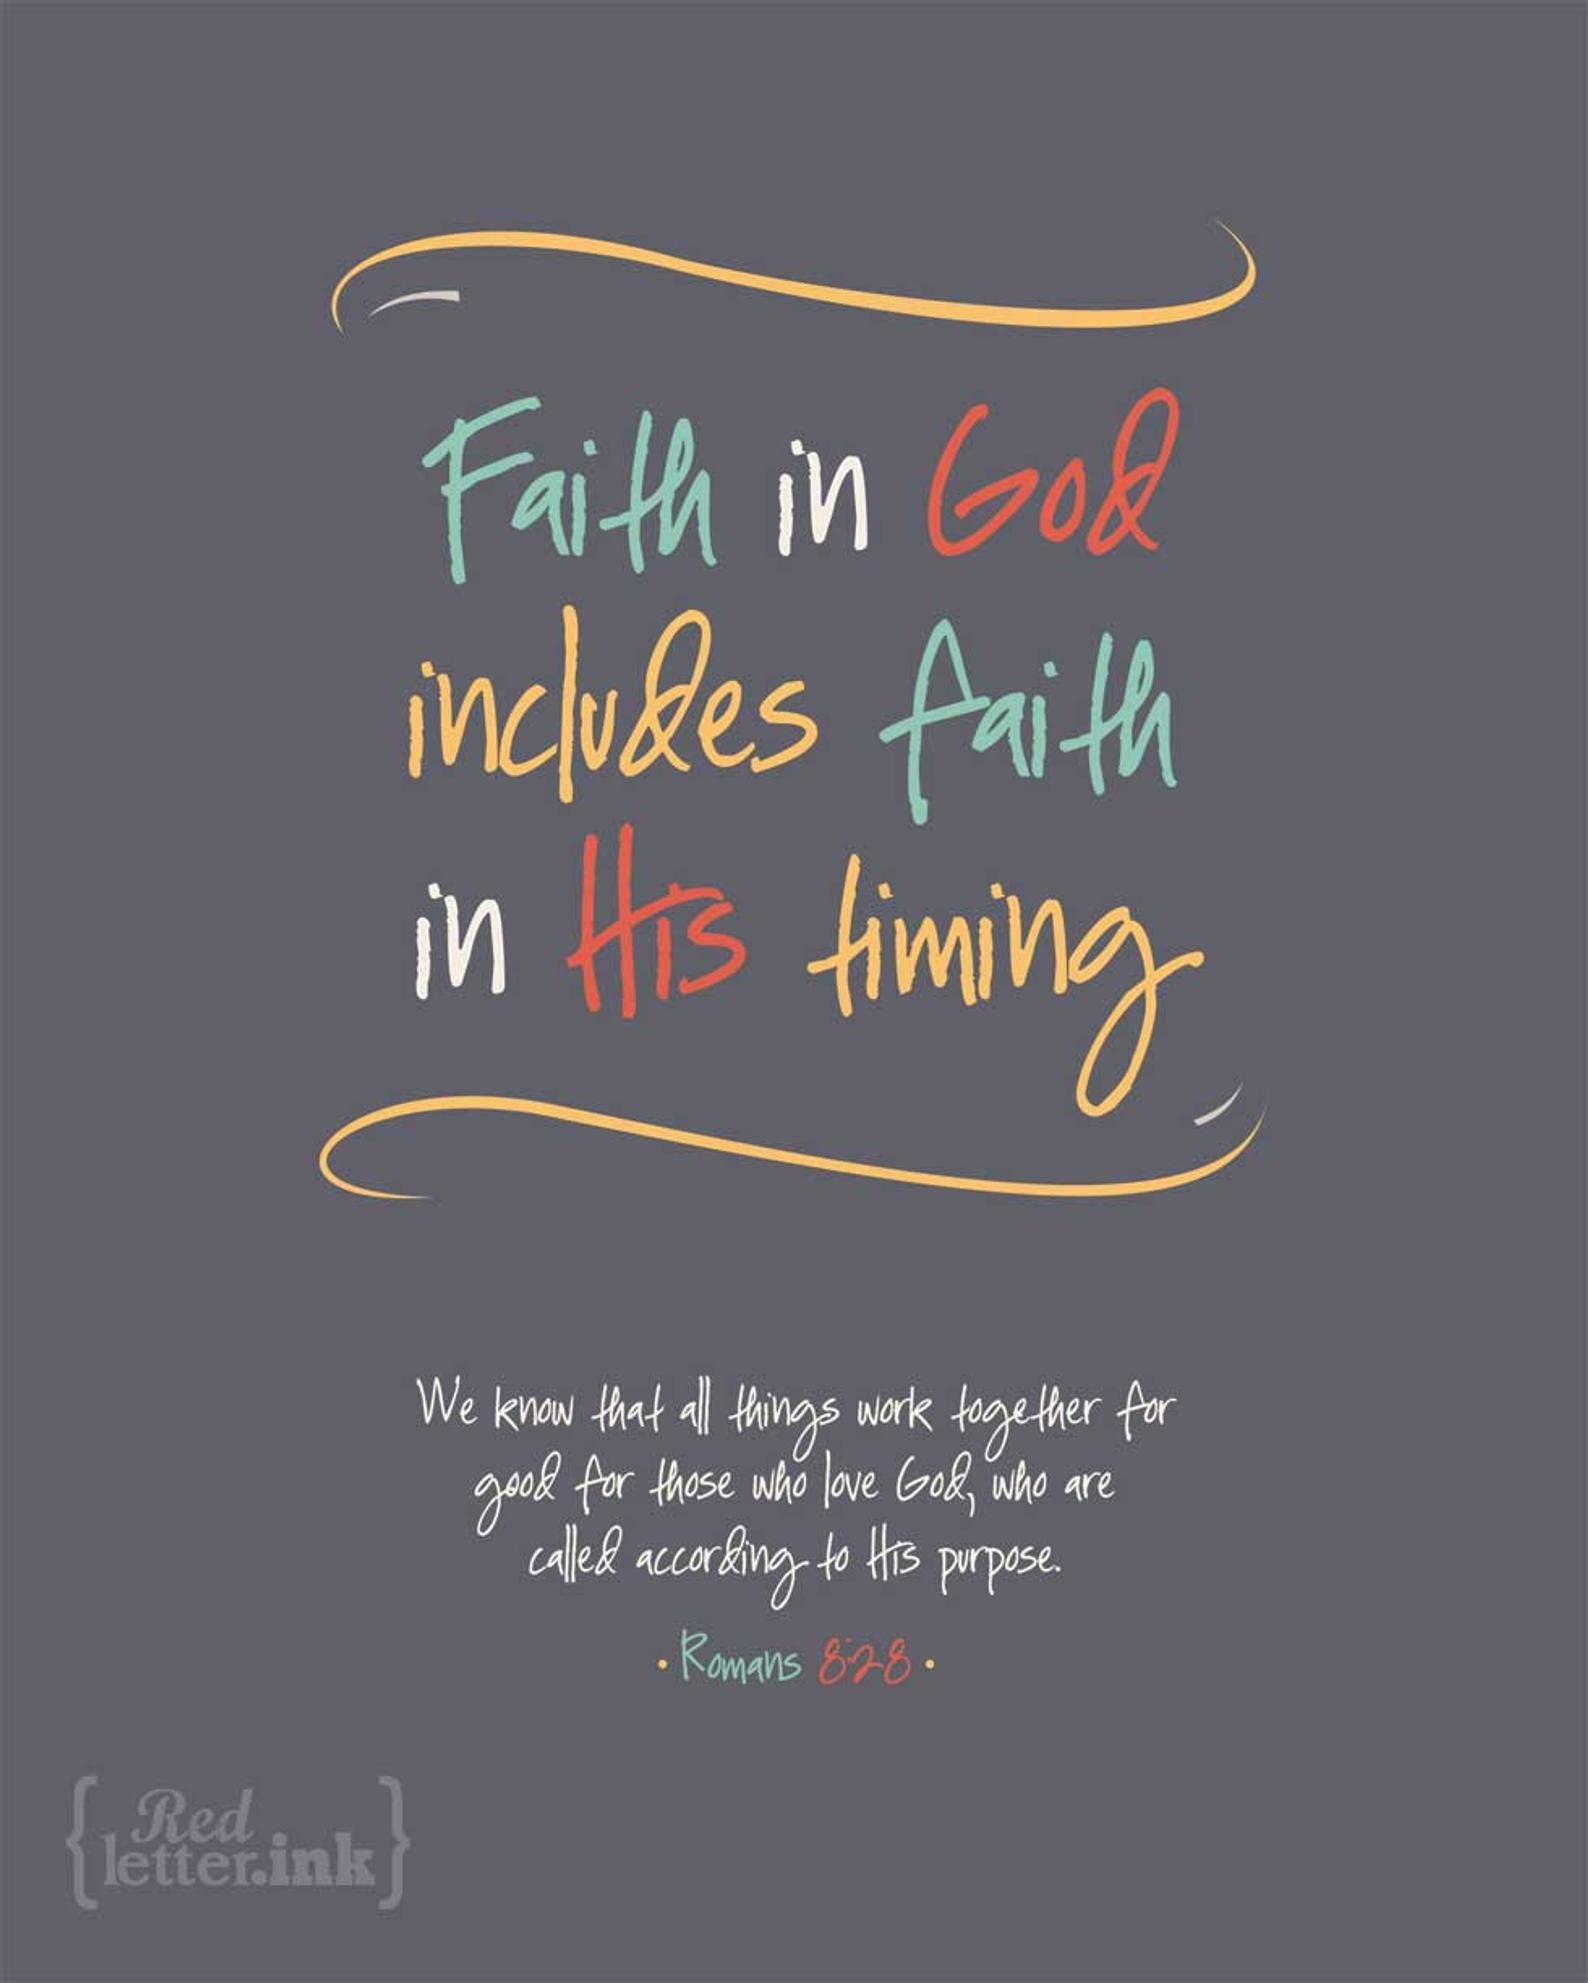 Wall Art LifePrints  Faith in God grey yellow teal   Etsy